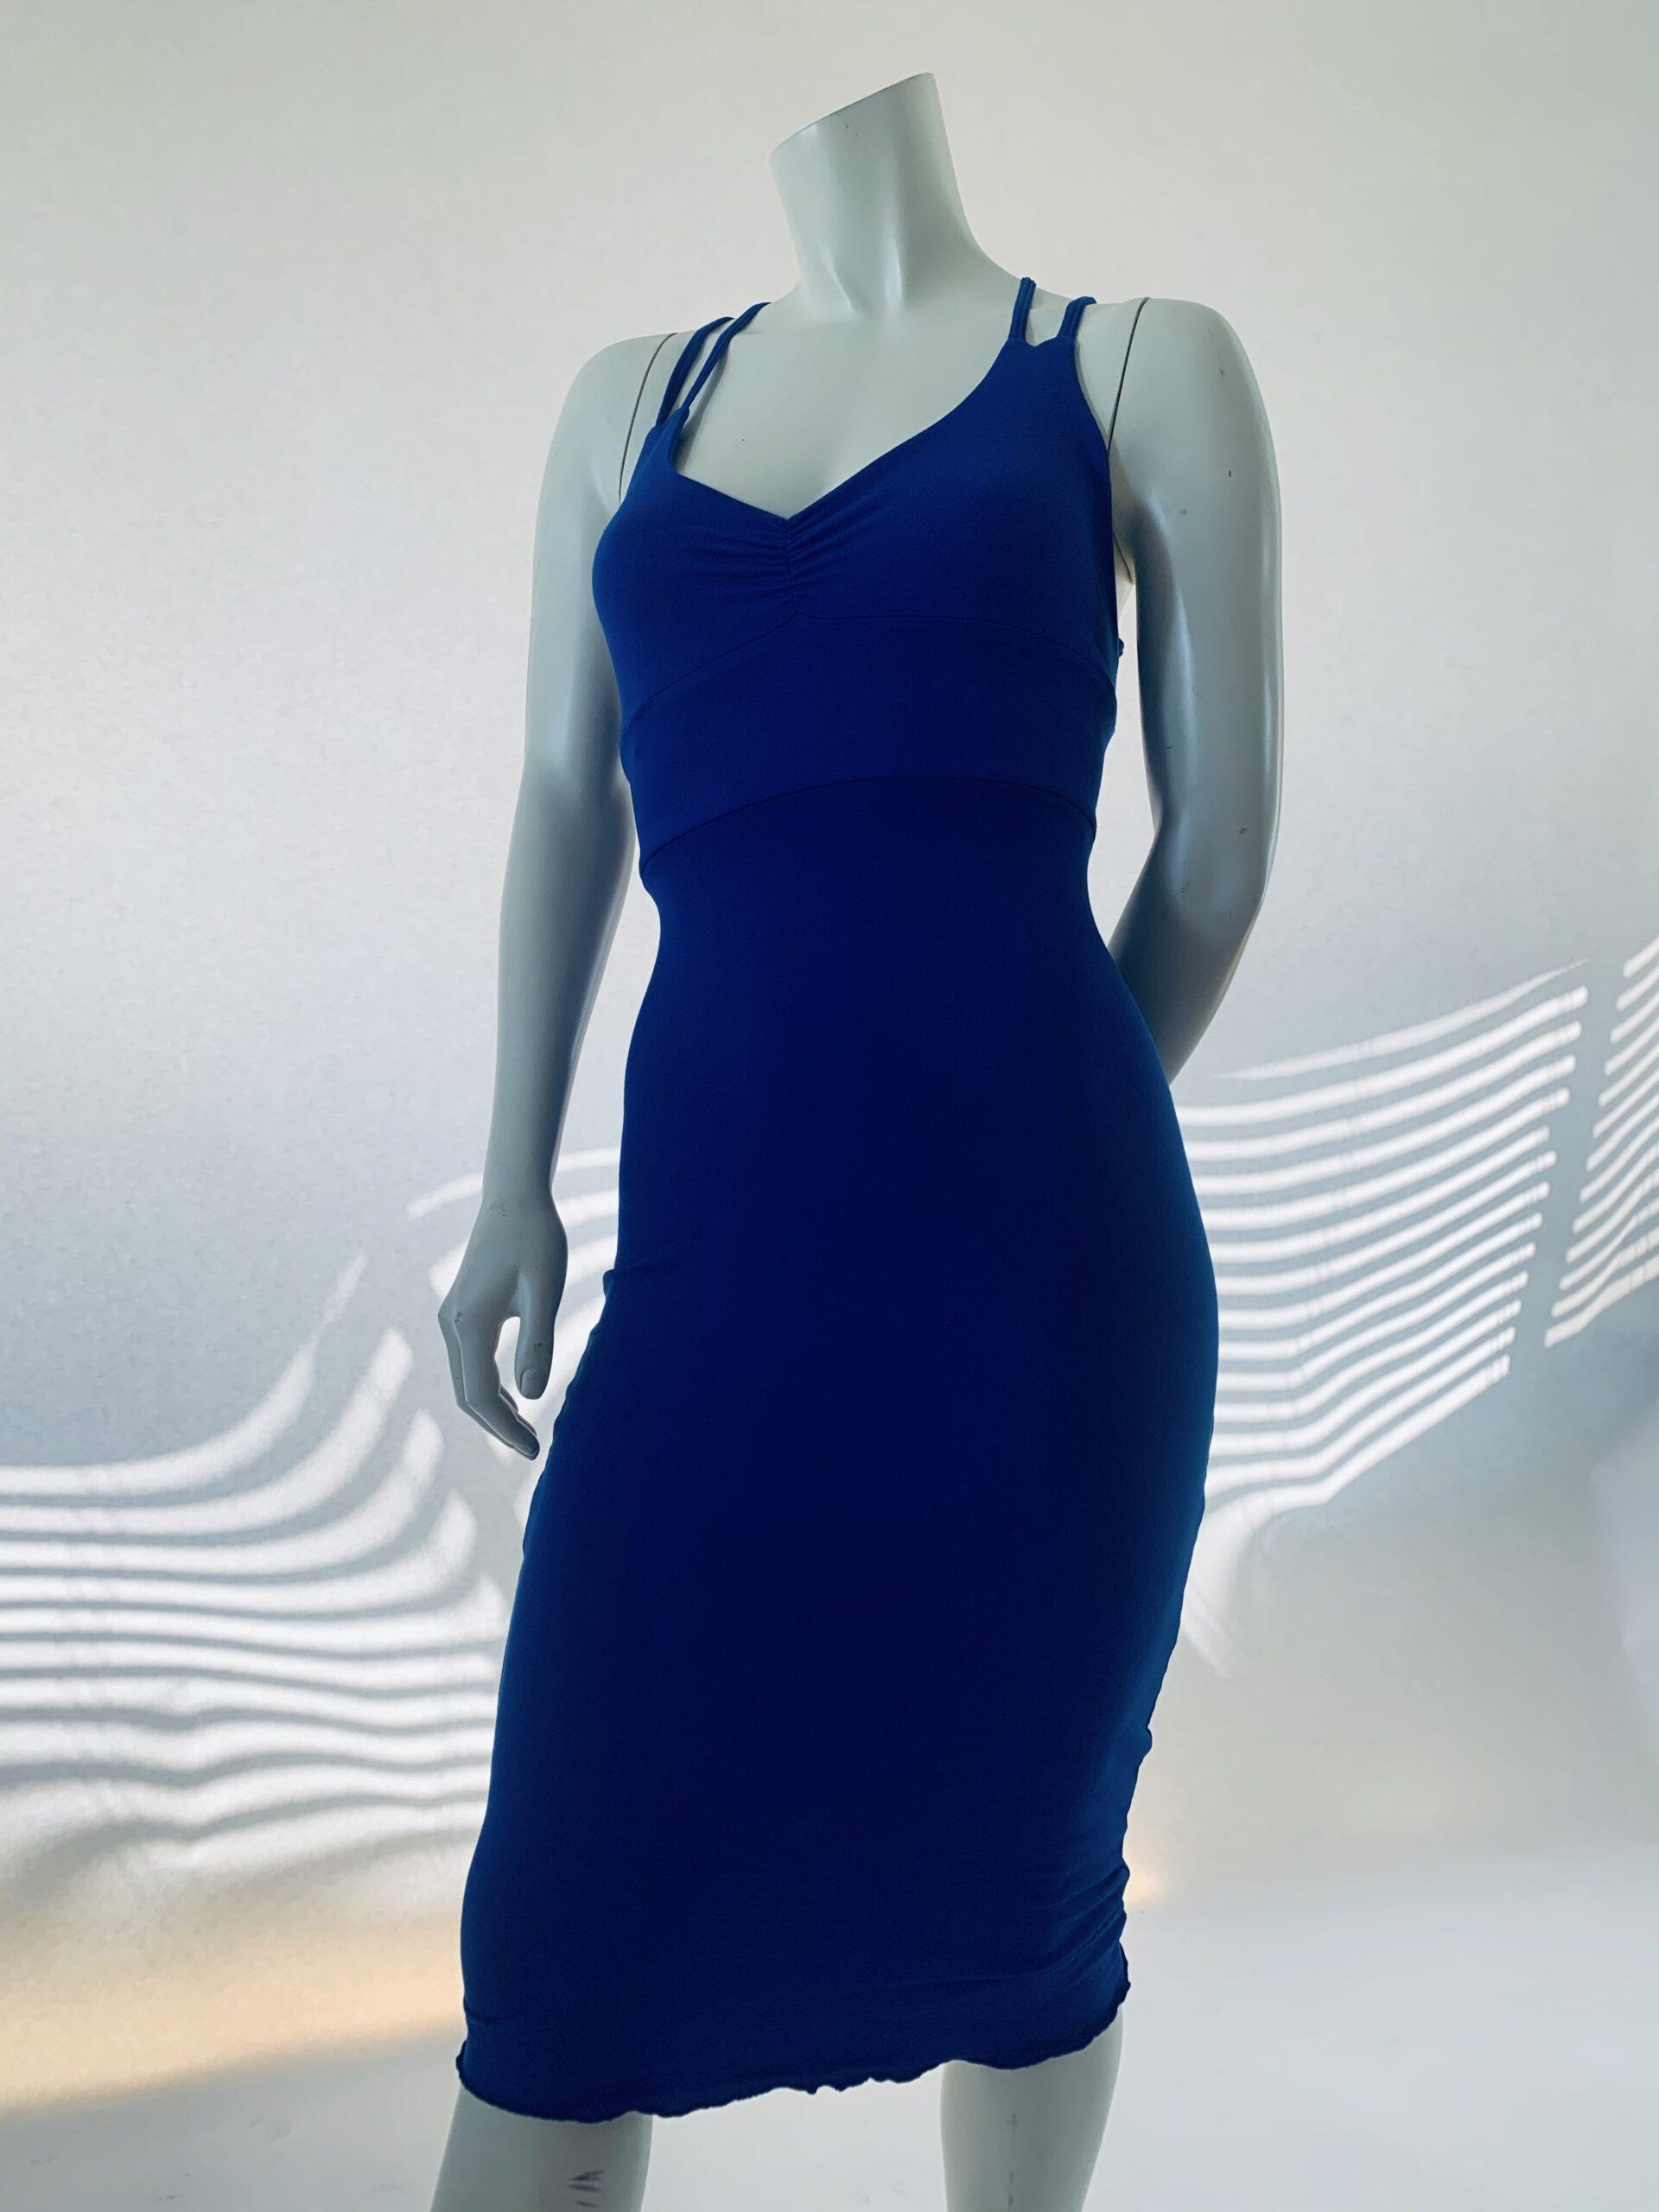 Four Strap Pencil Dress